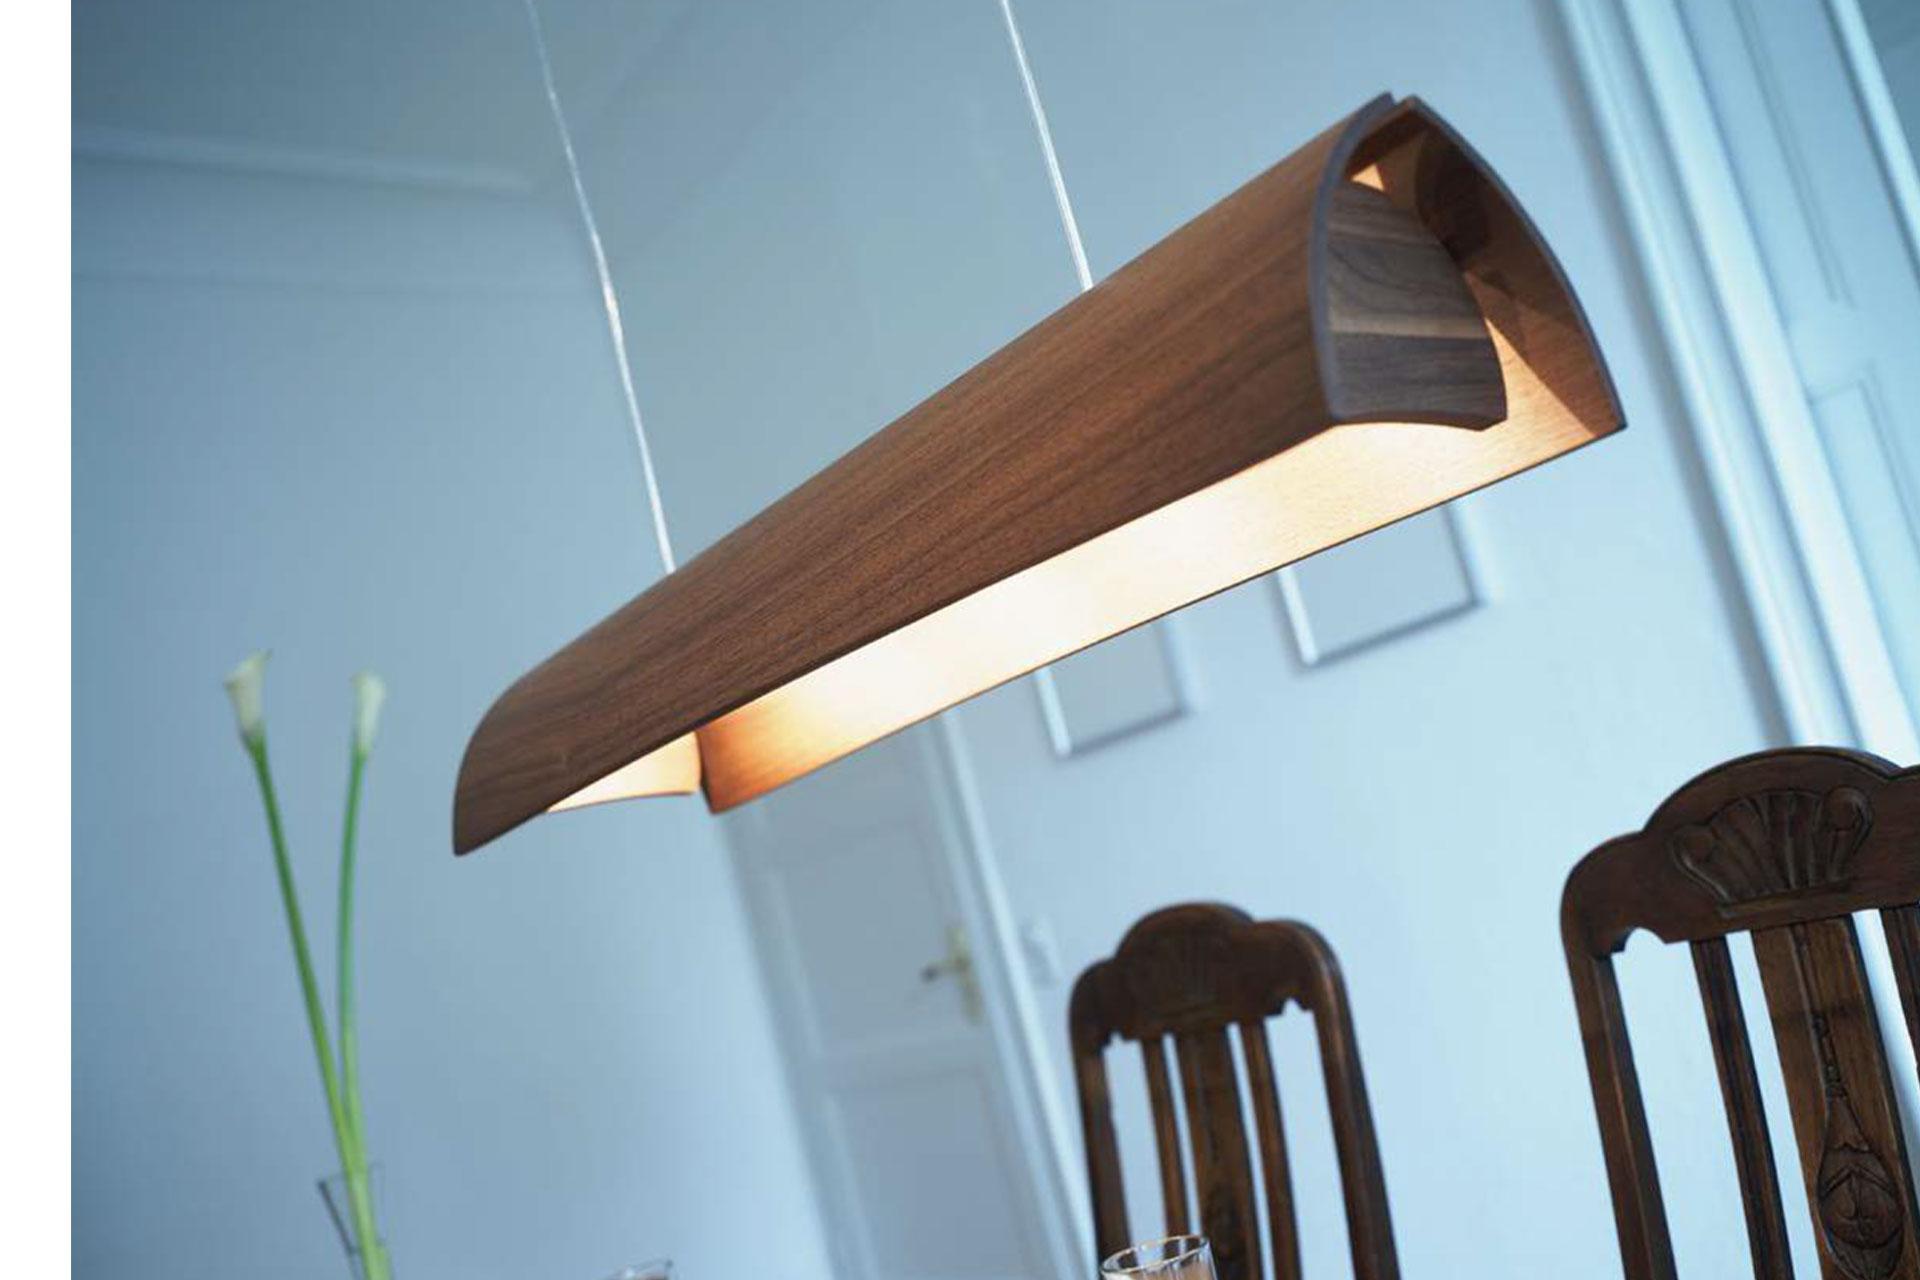 Pendelleuchte Arcus mit G9-Sockel für LED Retrofitlampe